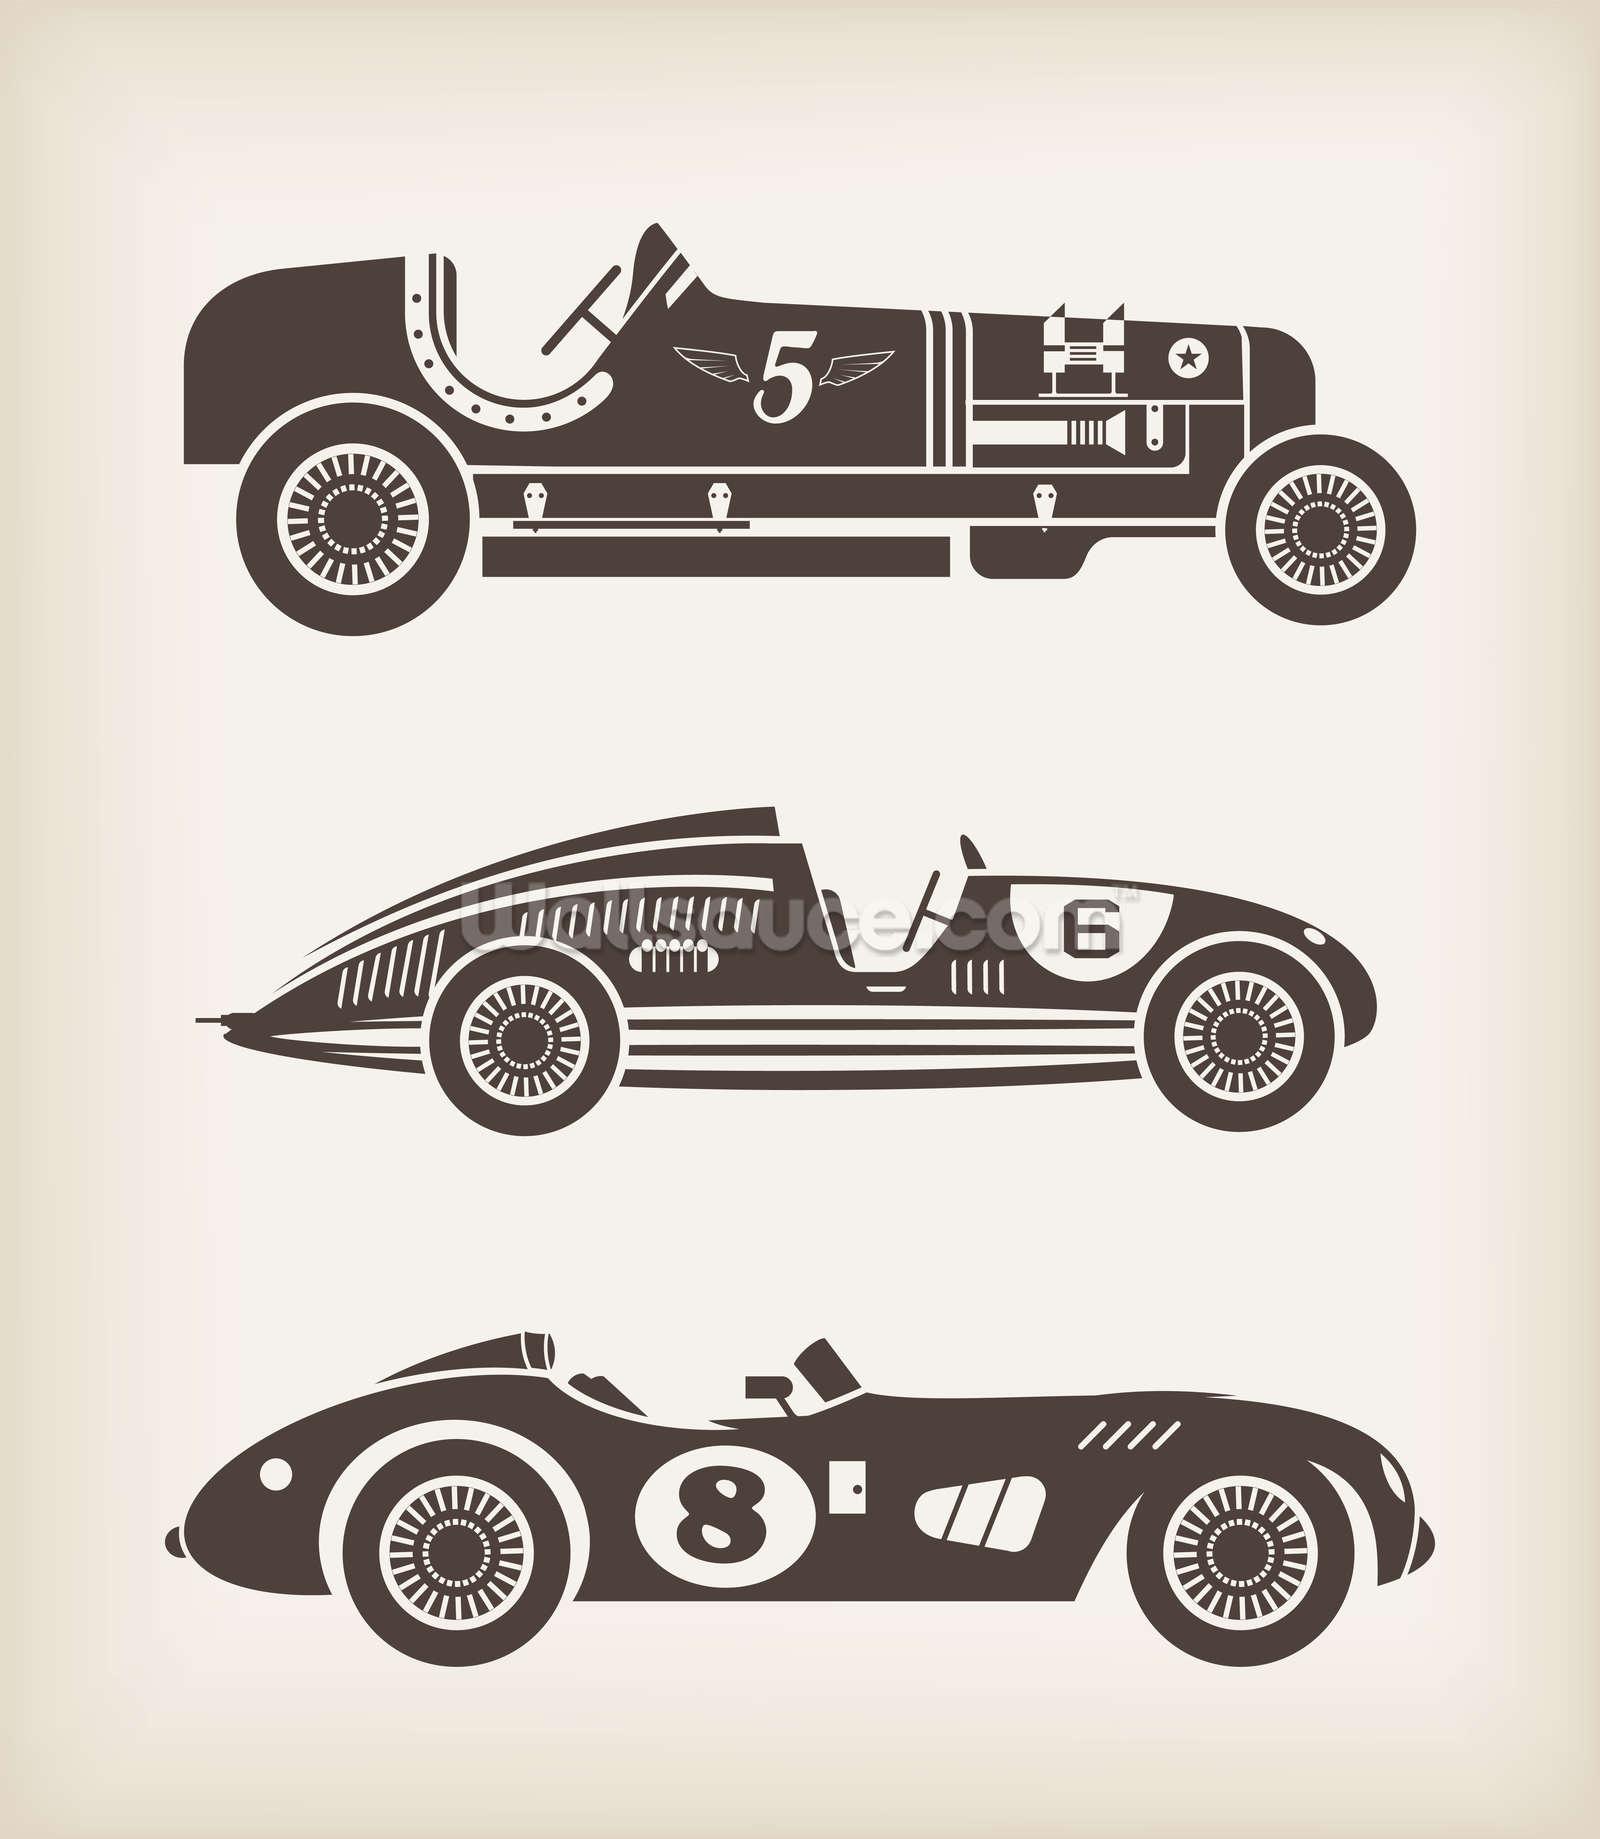 Formula 1 One Race Car Wallpaper Bright Vintage Racing Wallpaper Wall Mural Wallsauce Usa